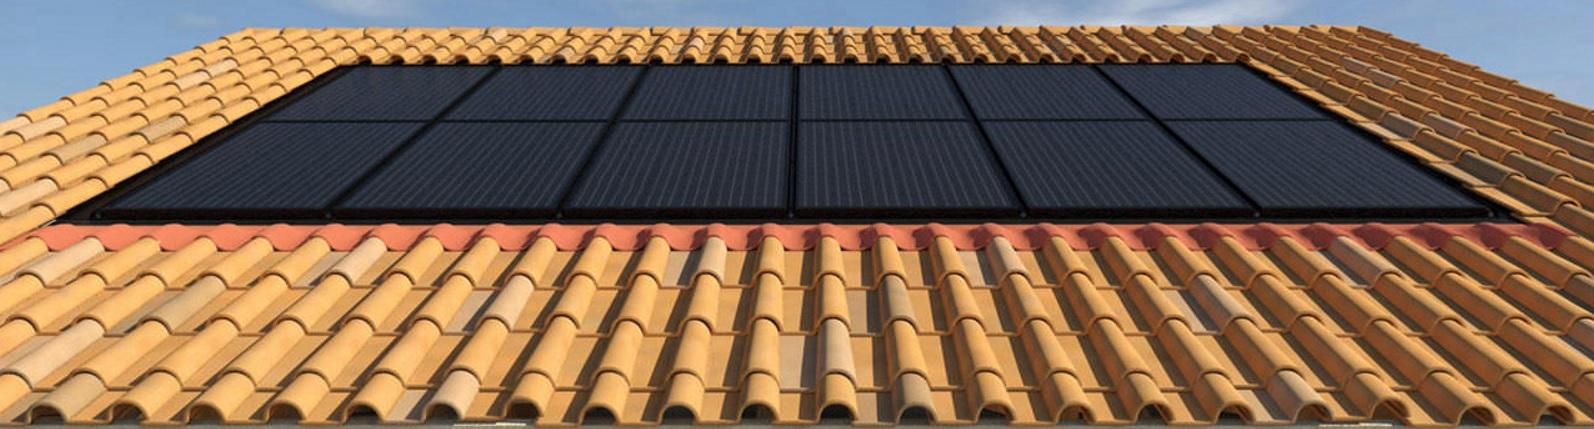 panel-fotovoltaico-termico-hibrido.jpg